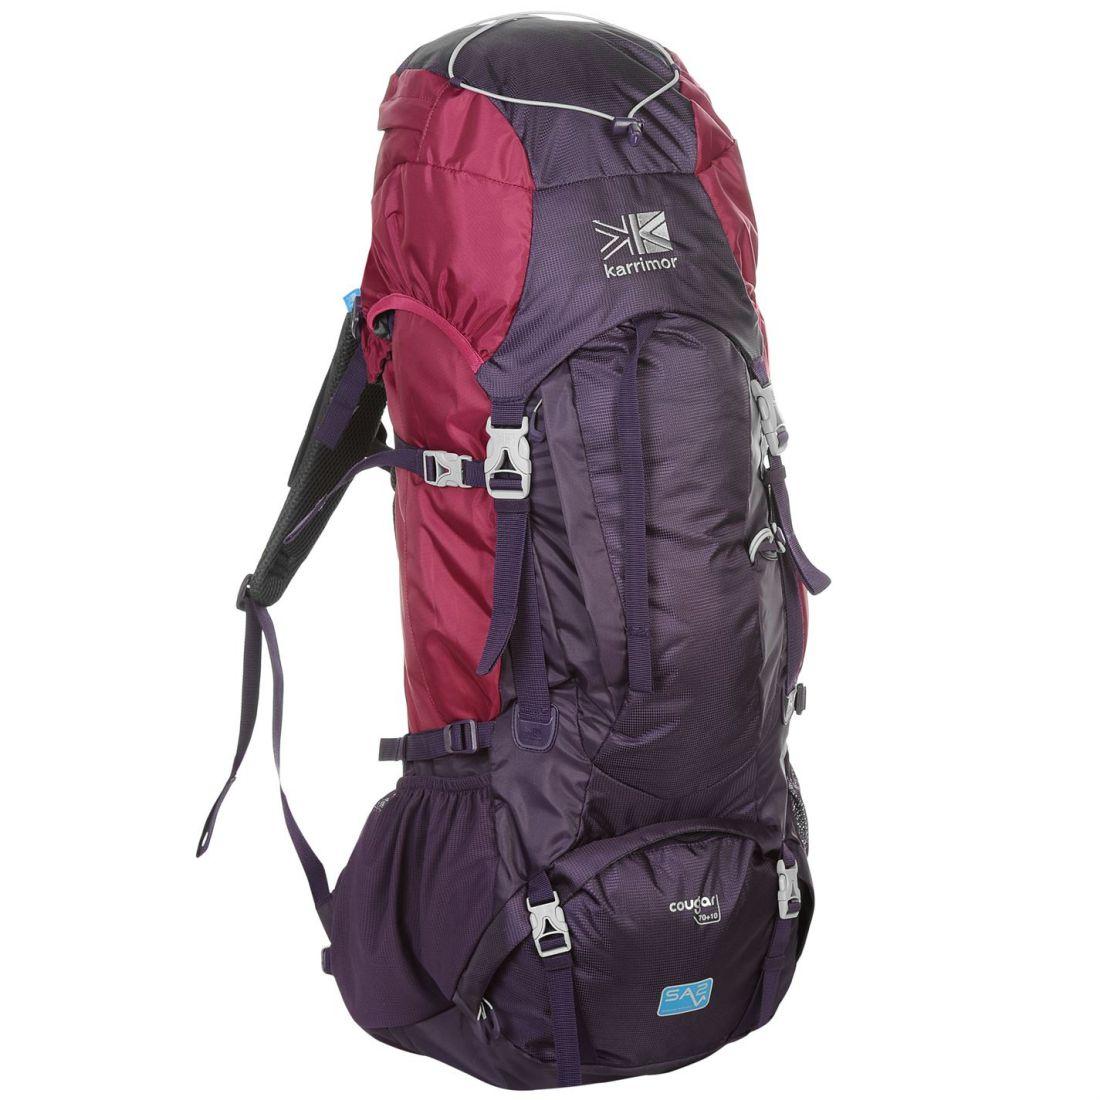 Karrimor Cougar 60+15 Rucksack Ventilated Outdoor Hiking Trekking Bag  Backpack bd88bb8f63b9e